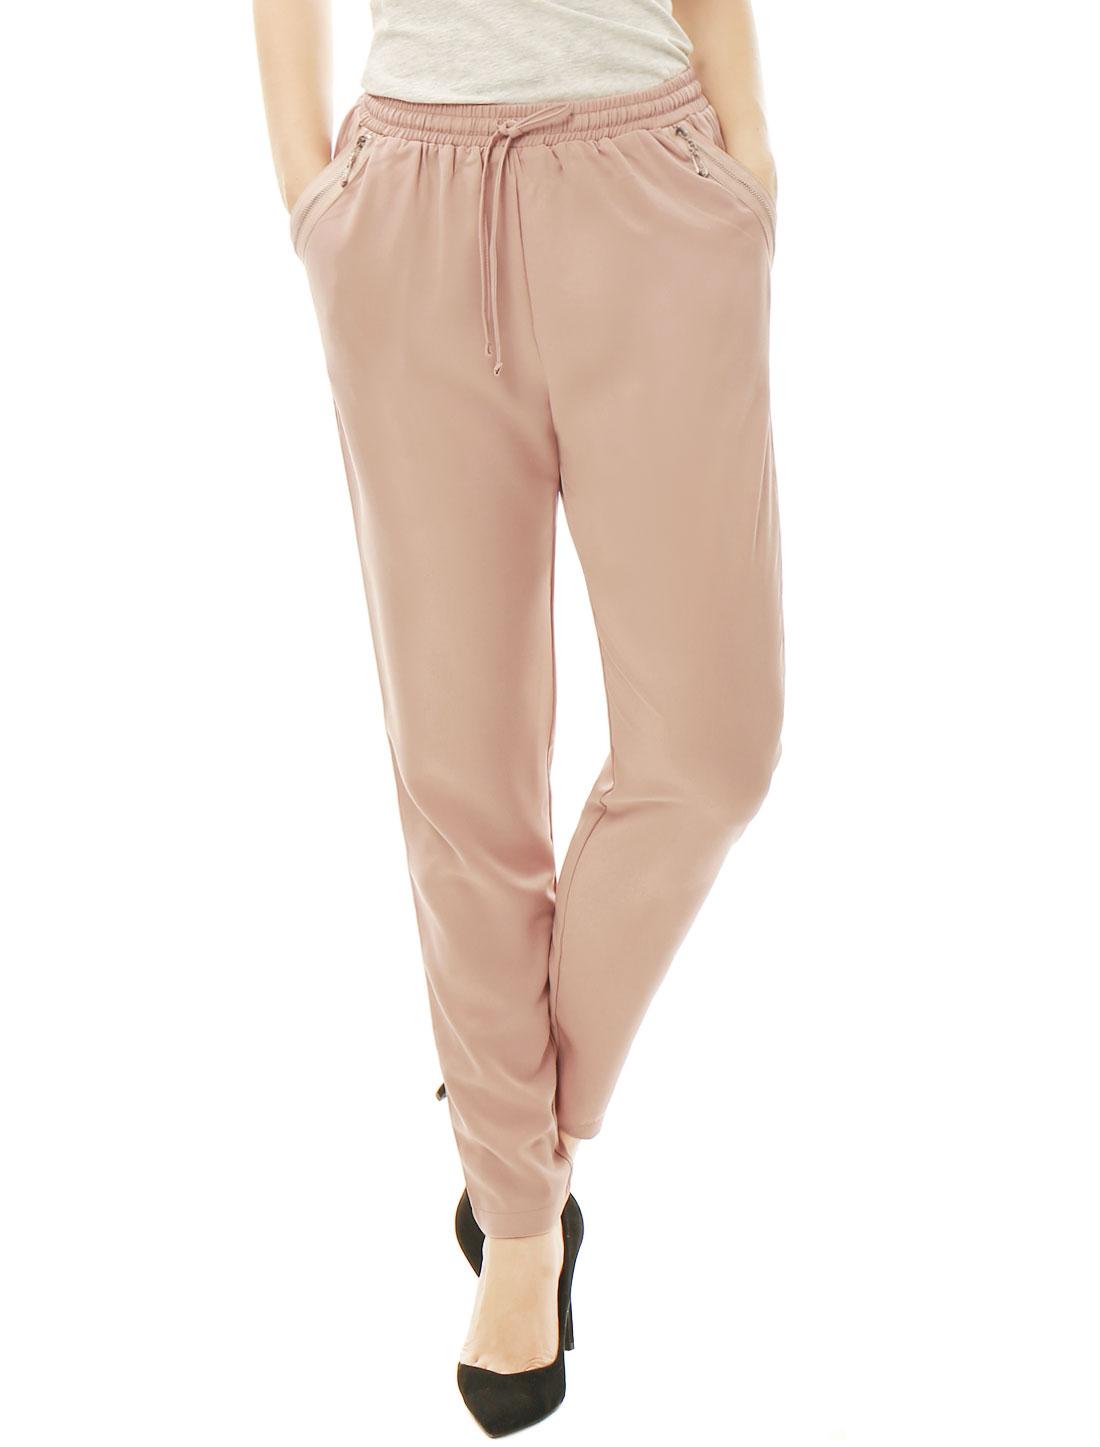 Women Drawstring Elastic Waist Slant Pockets Pants Pink S